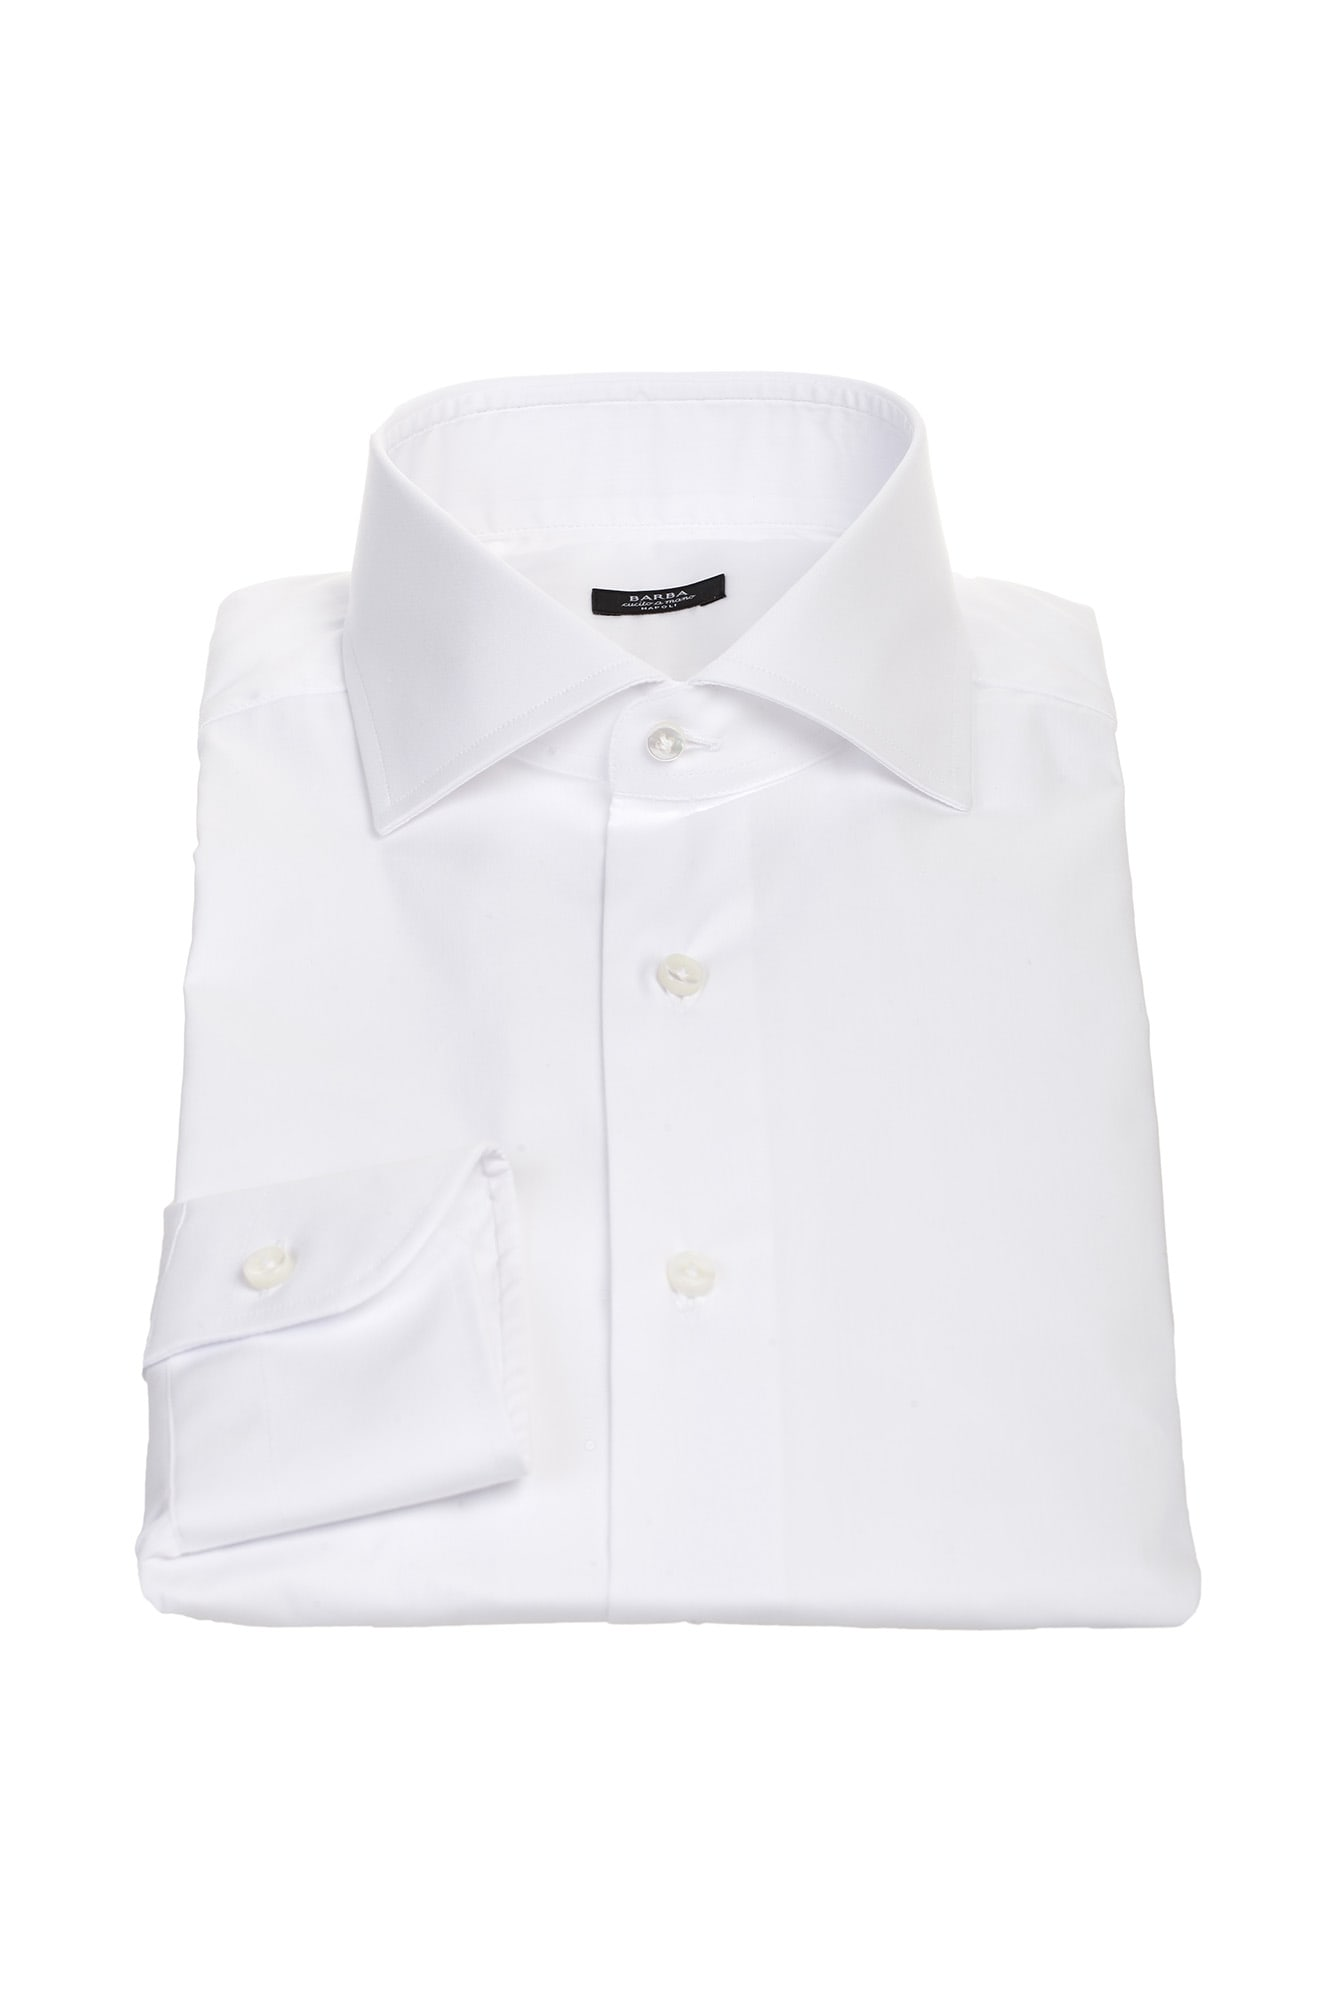 Barba white shirt